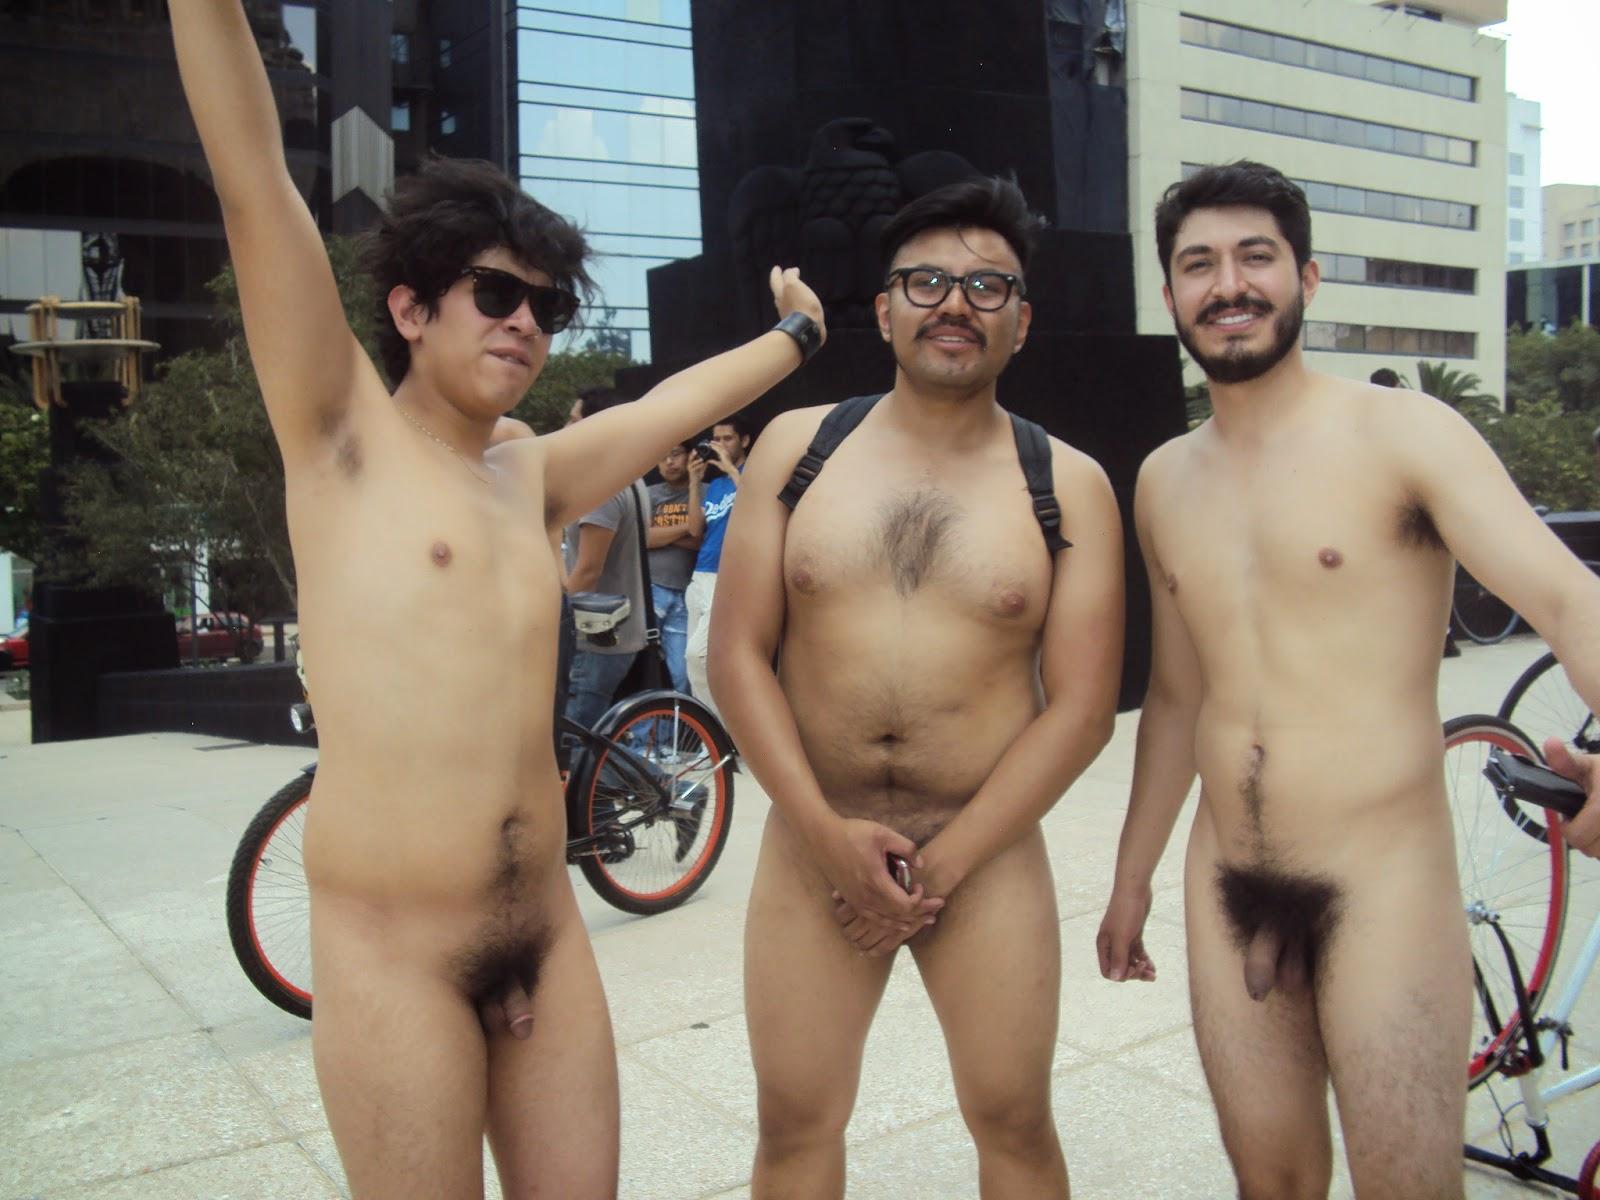 naked women of guadalajara mexico